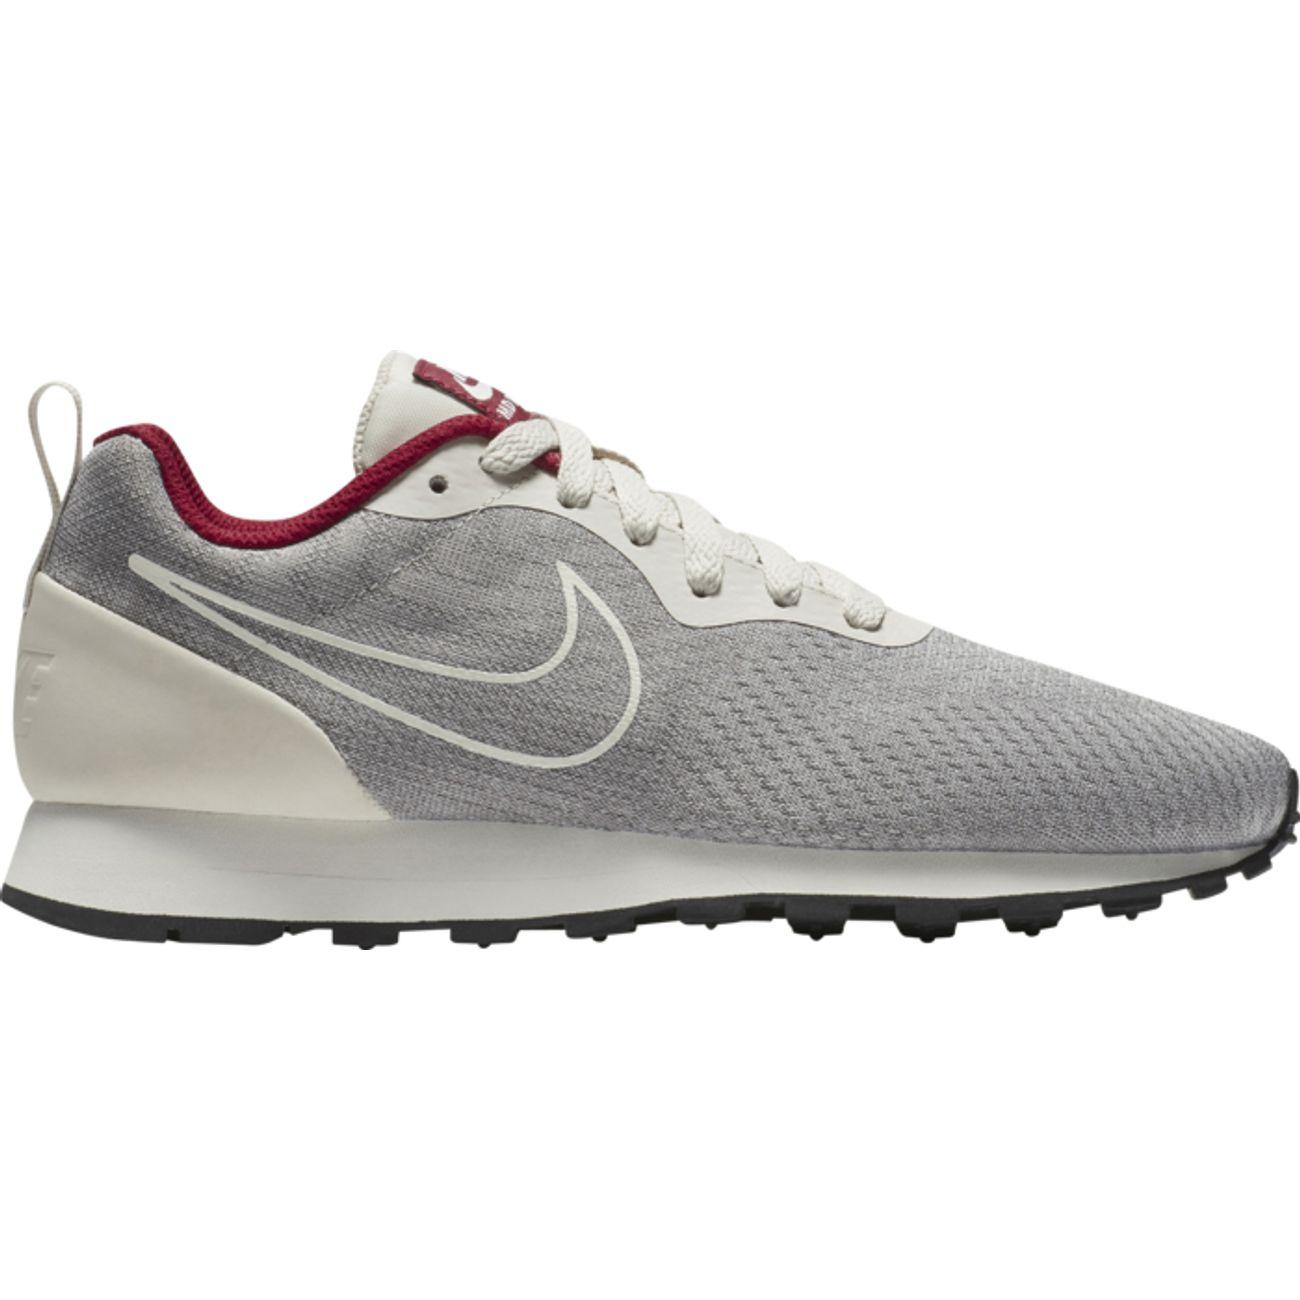 Runner 2 Chaussures Nike Md Eng Basses Femme qSVpUzM